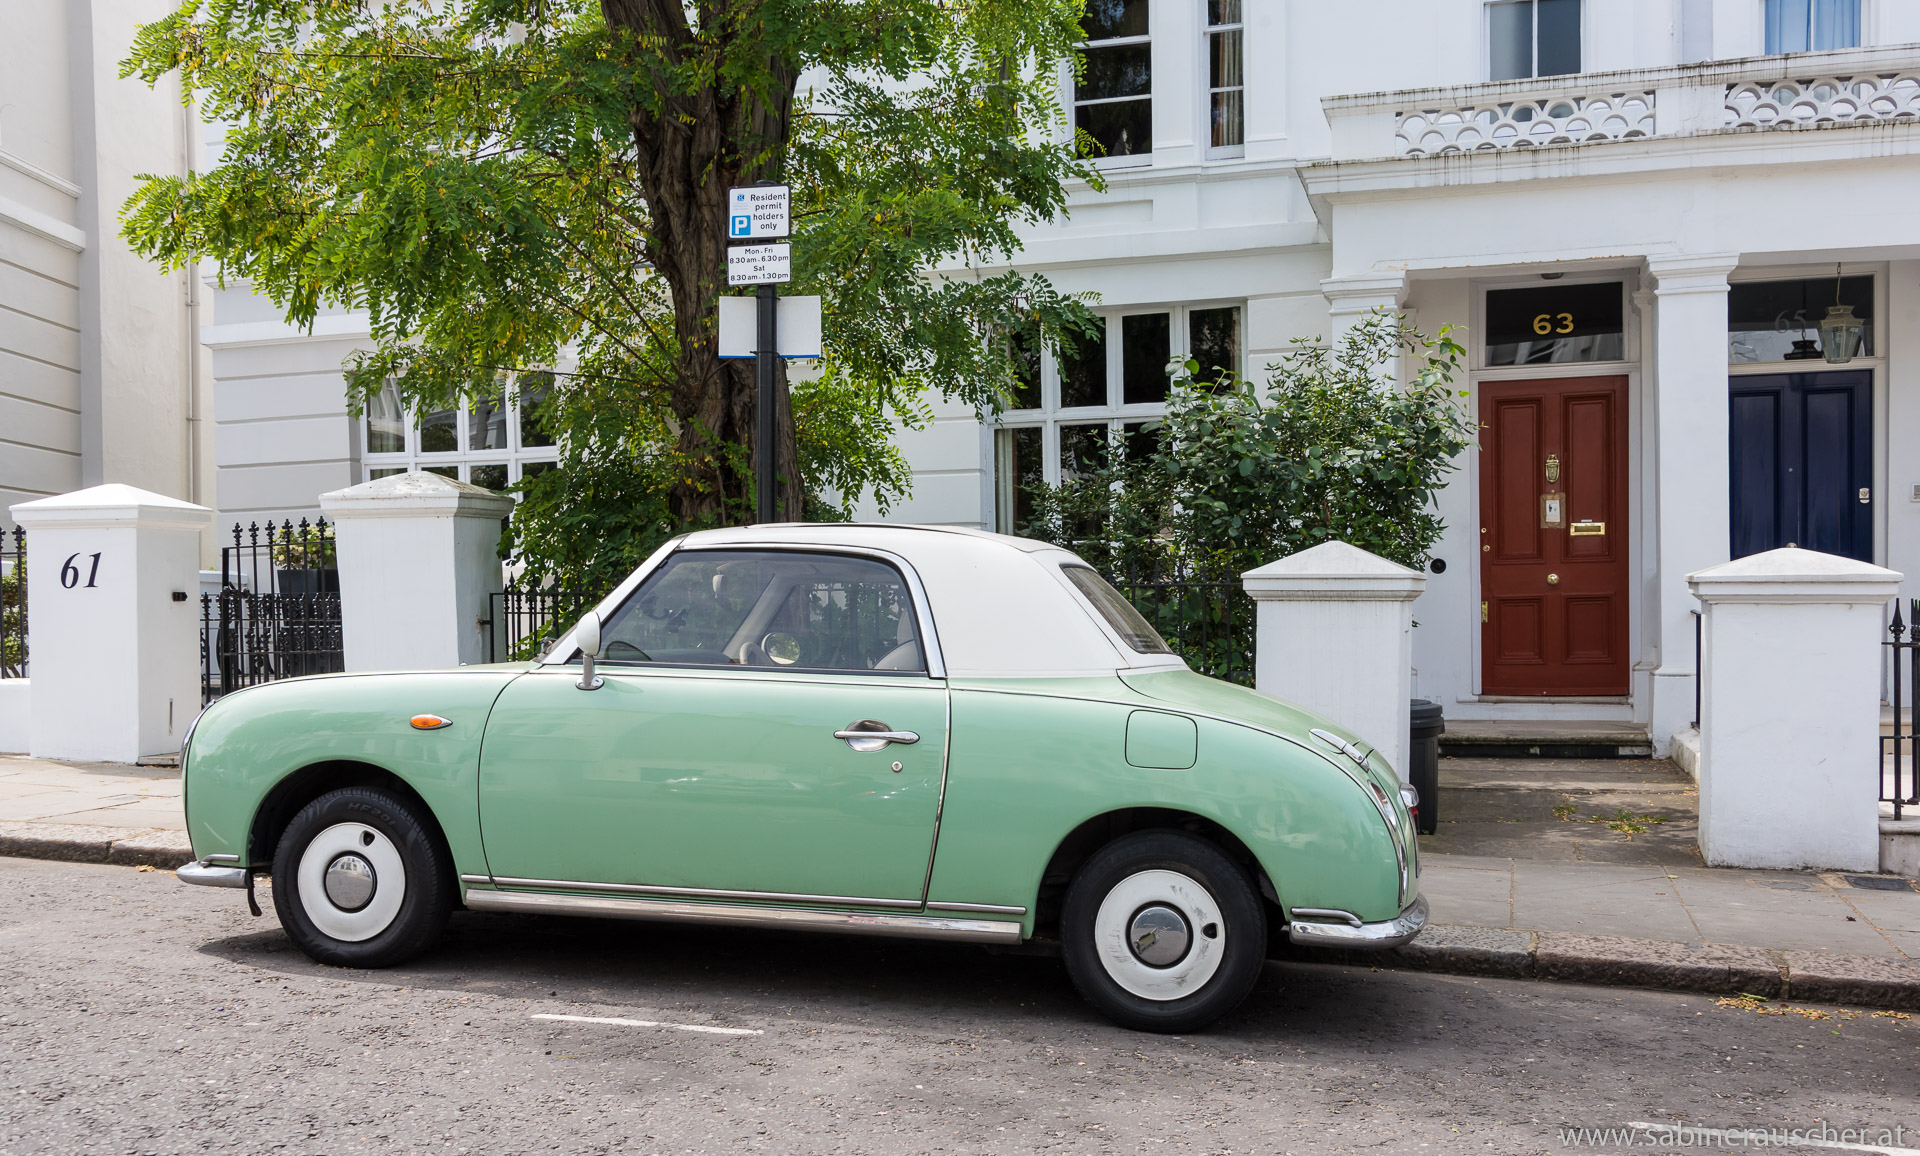 Oldtimer in Notting Hill